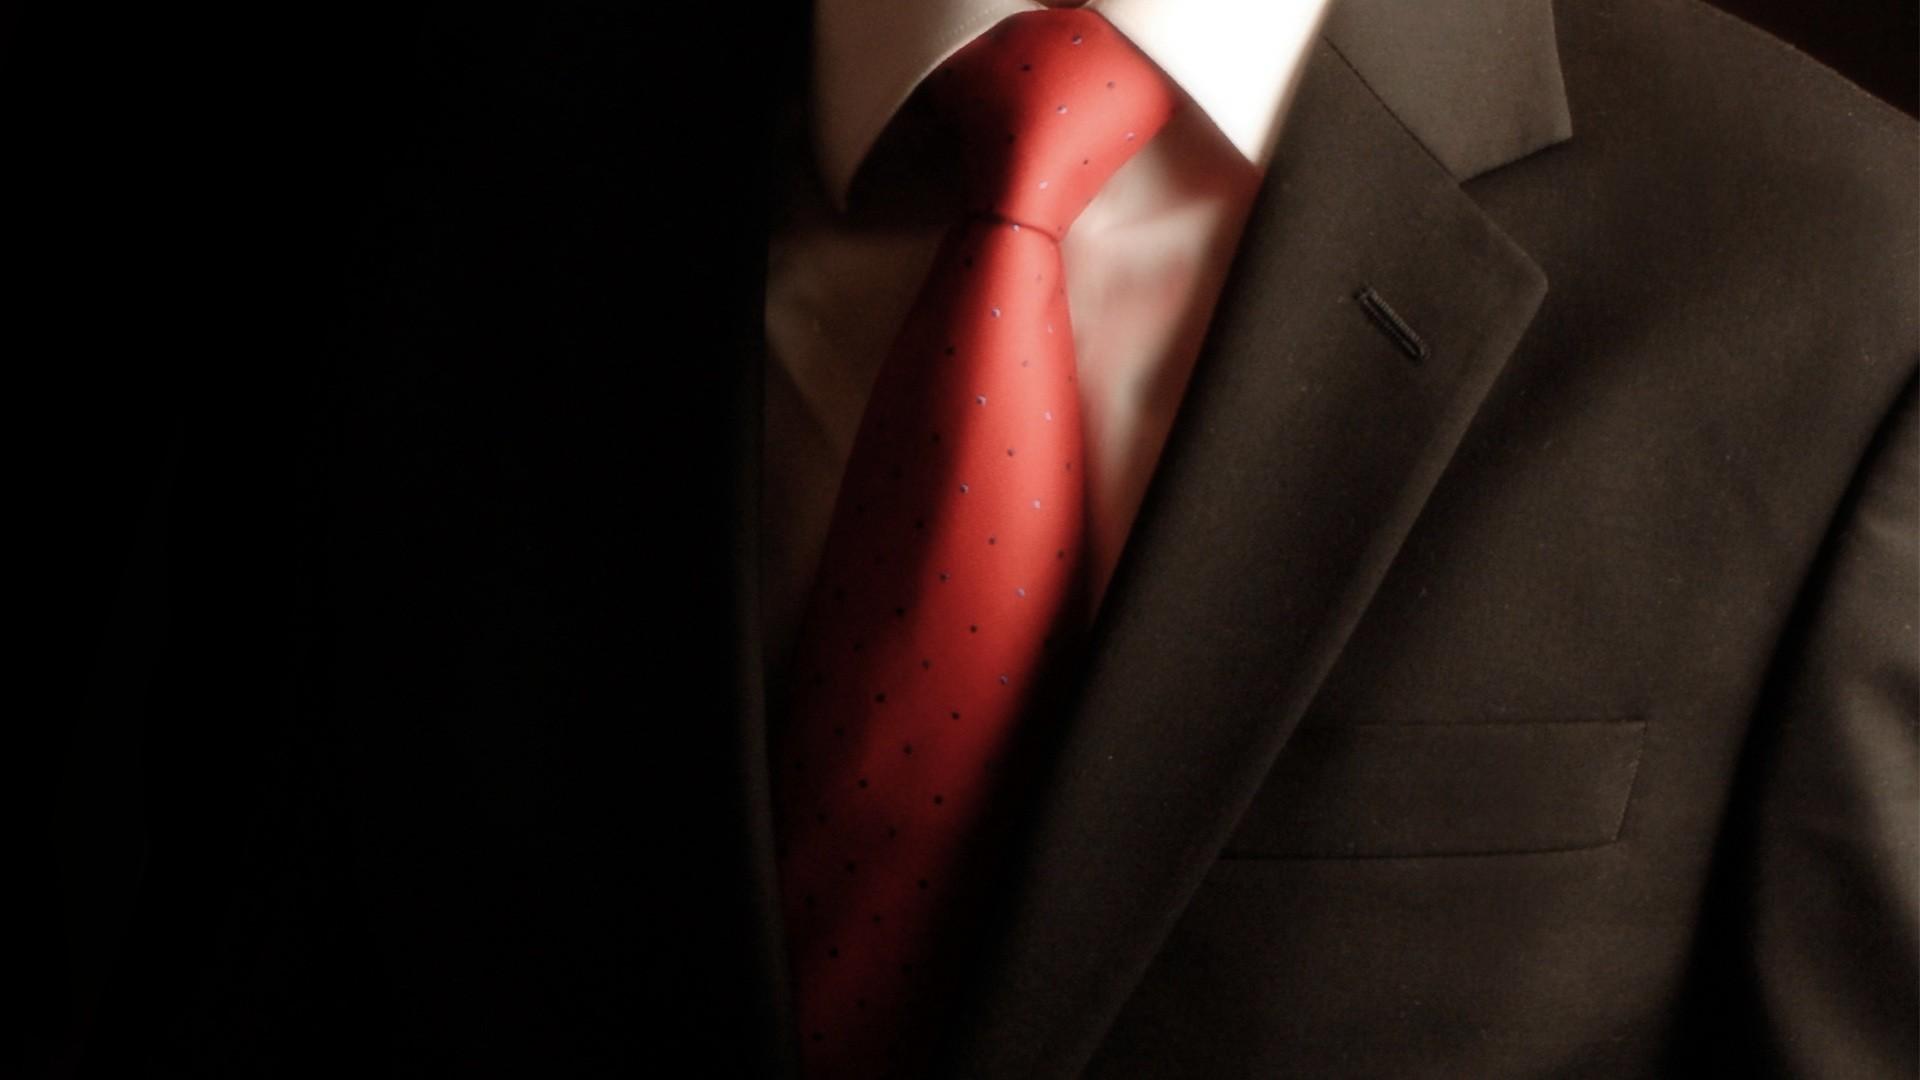 Agent 47 Hitman Pices Suit Tie Tuxedo